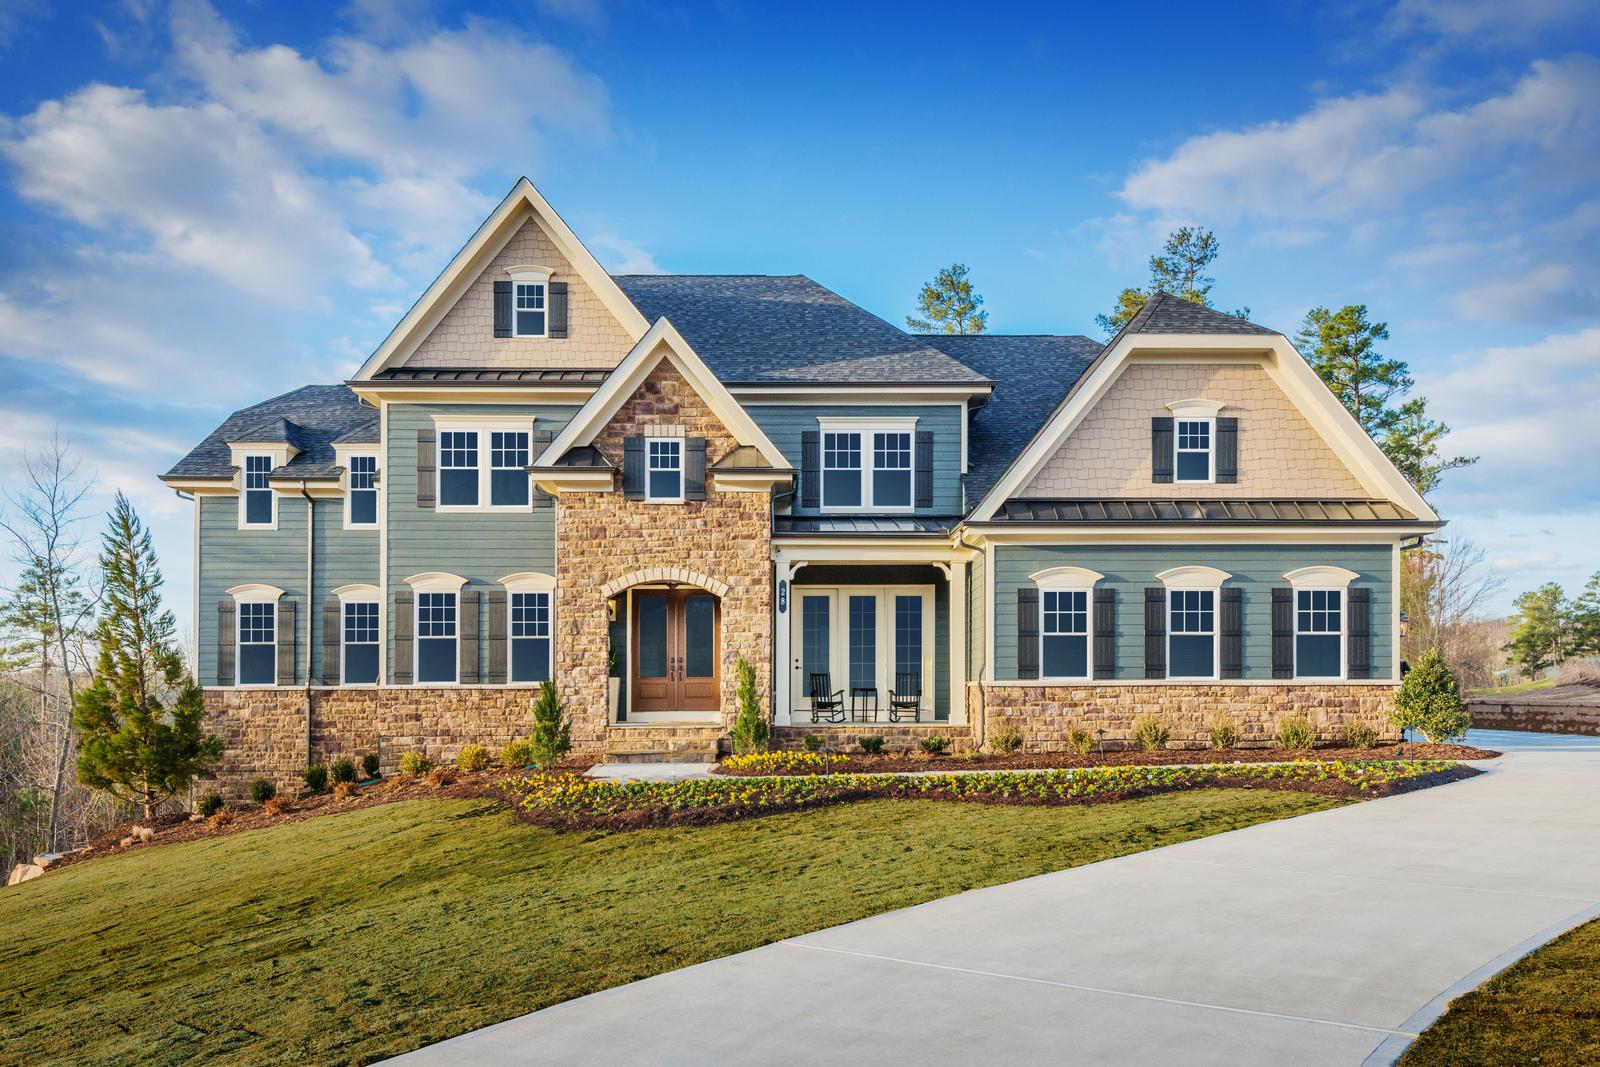 New regent 39 s park ii home model for sale heartland homes for Heartland homes pittsburgh floor plans